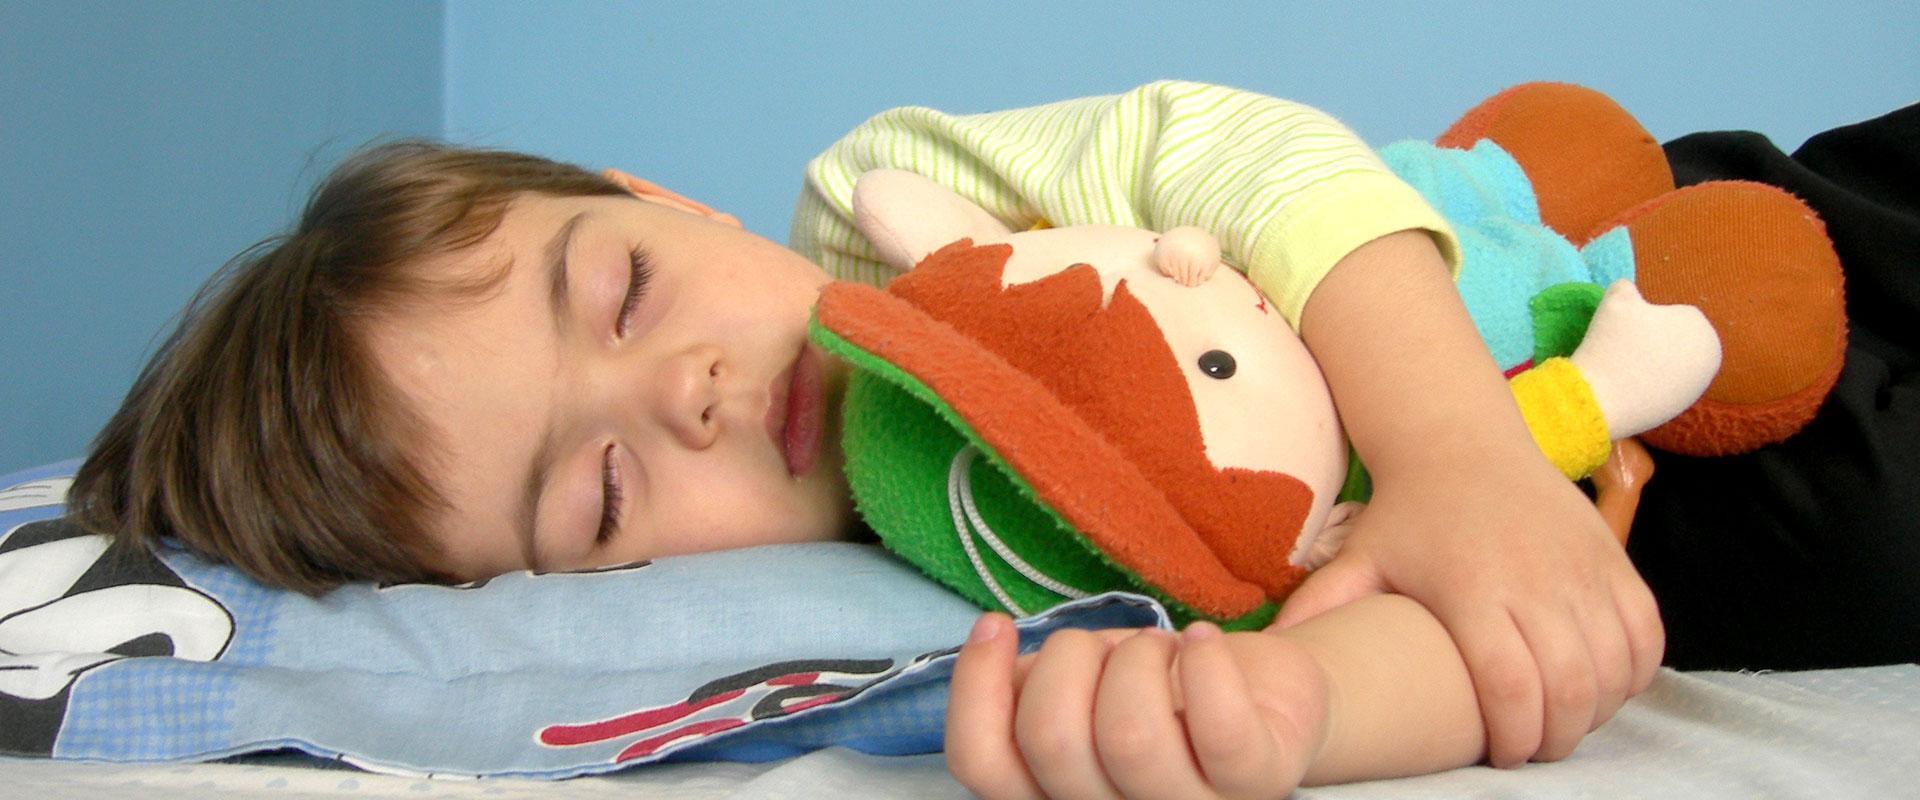 ¿Sabes cómo debes despertar a tu niño?